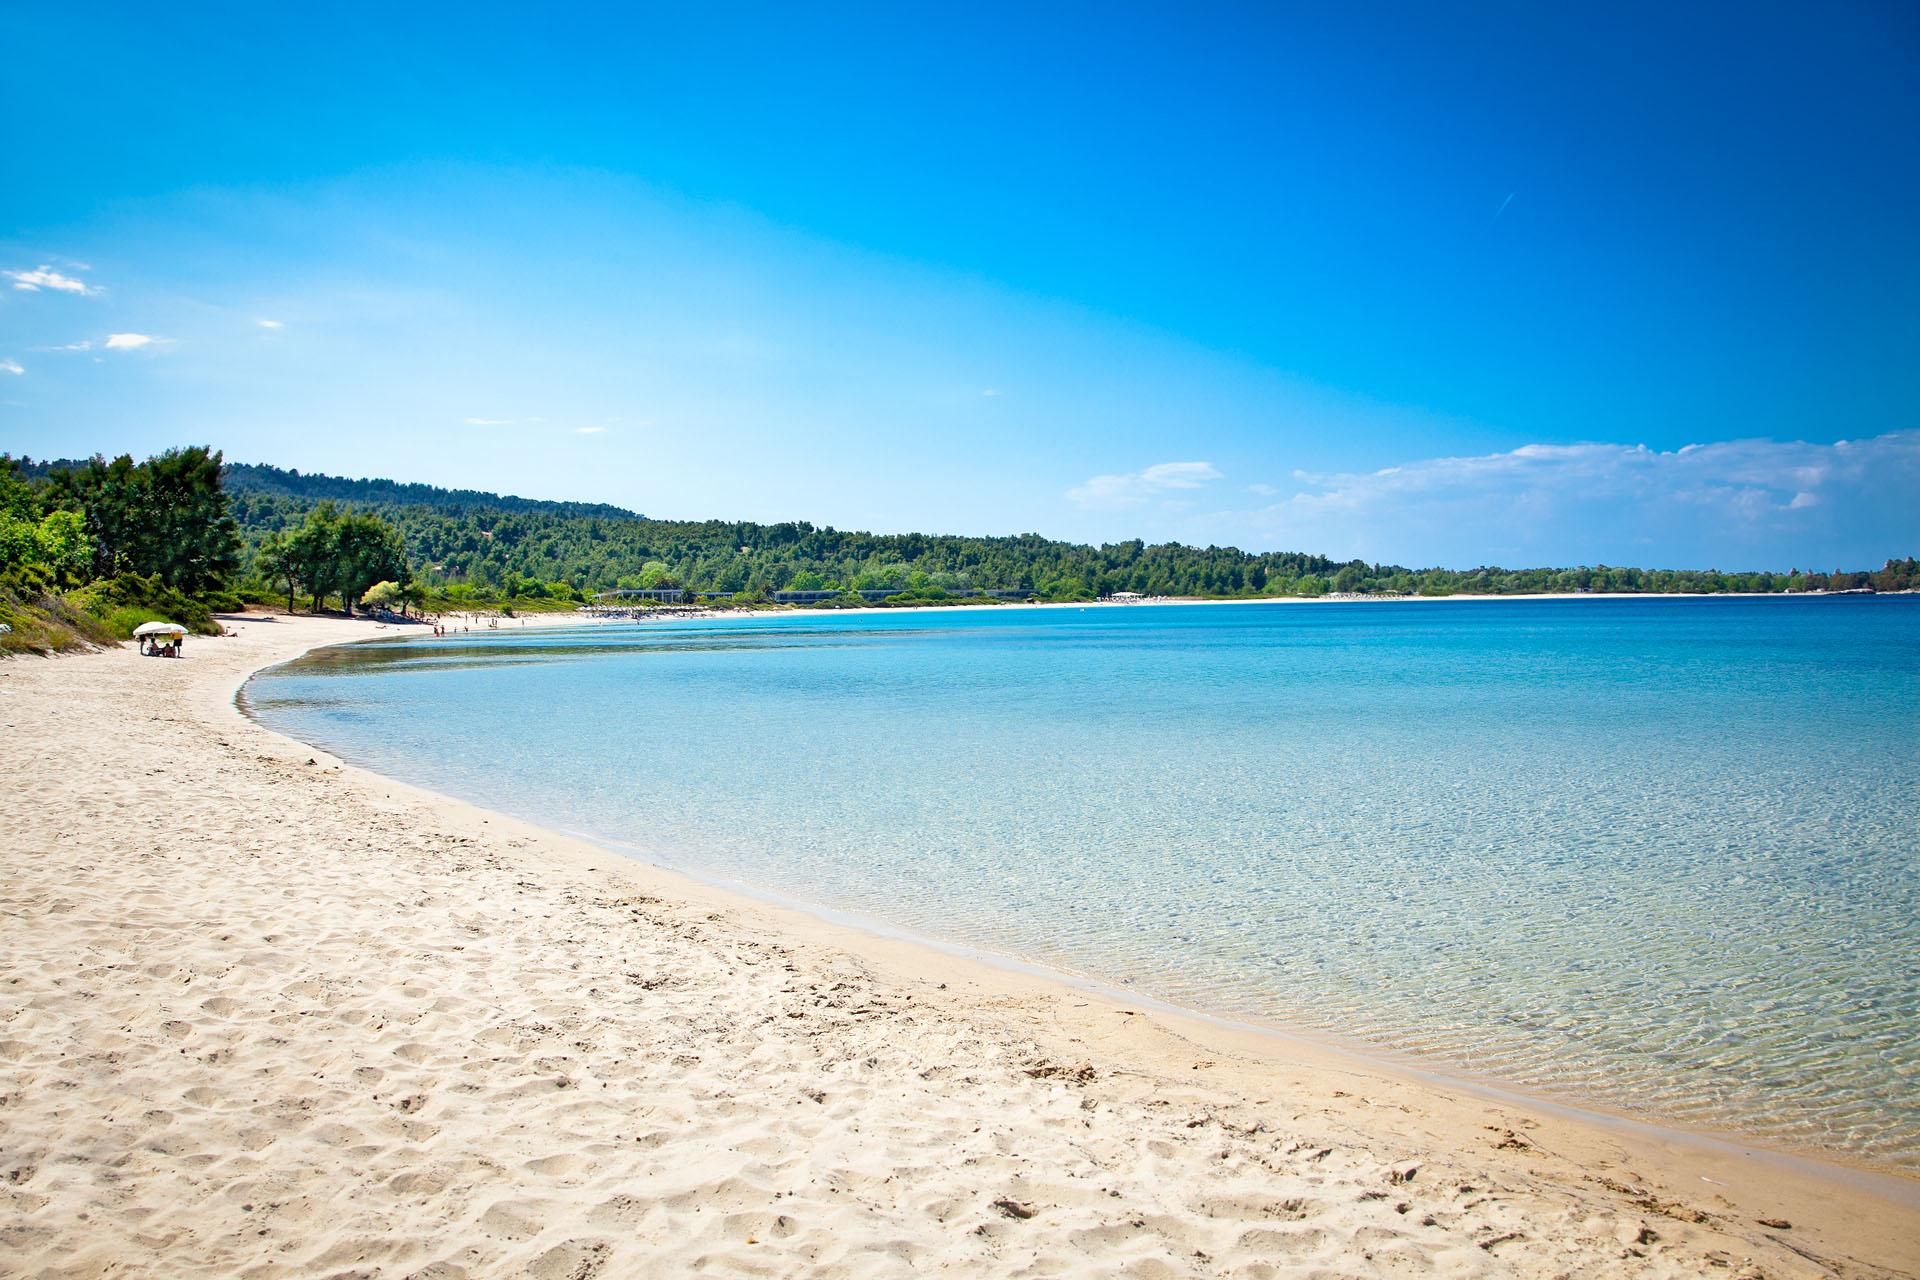 Paliouri plaża, Chalkidiki